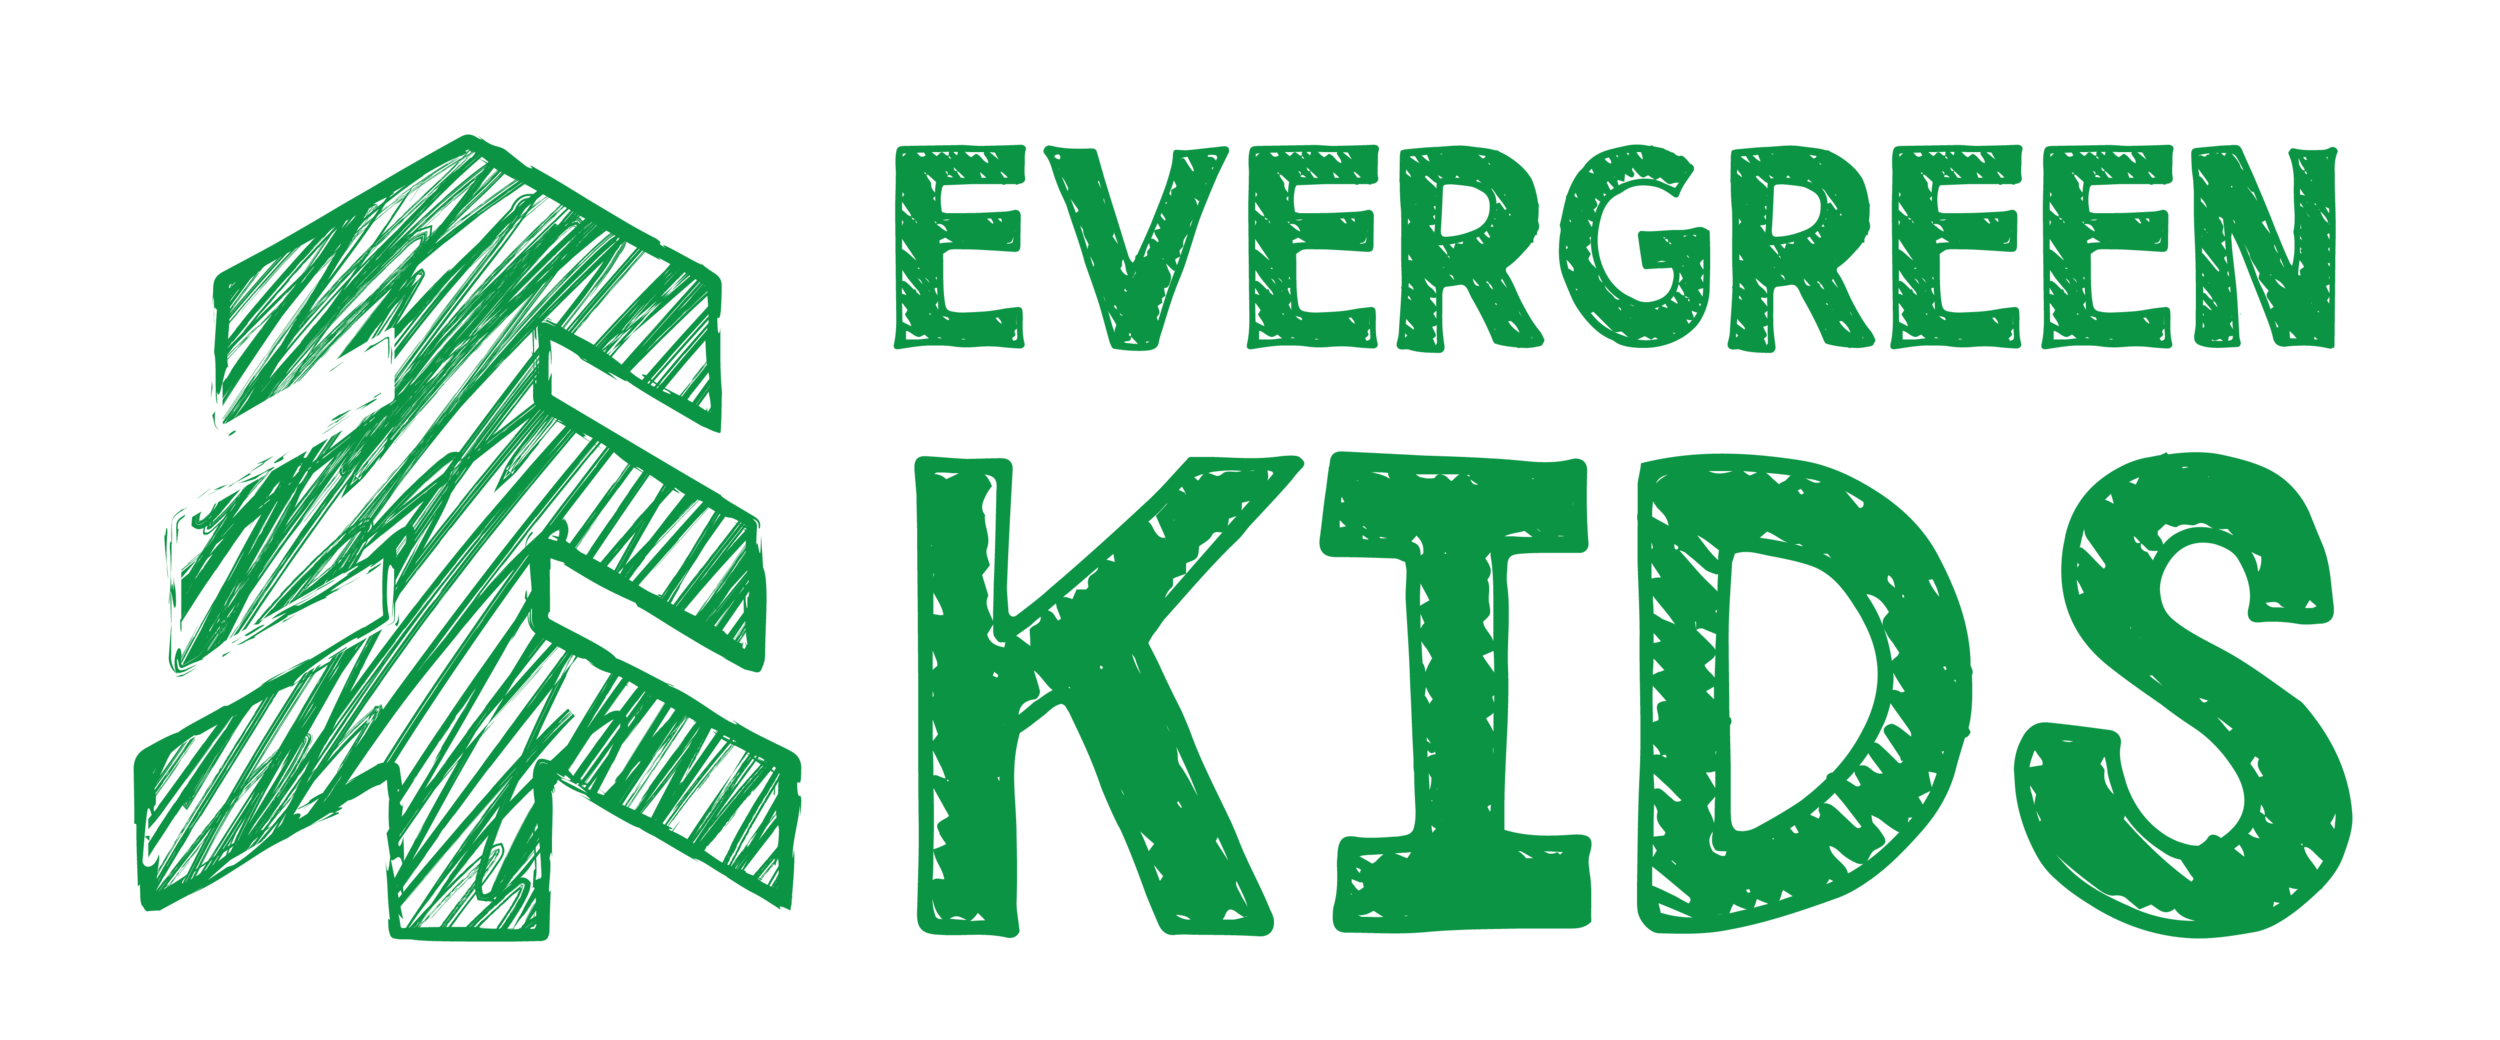 Evergreen Kids Logo FINAL-02 copy.png